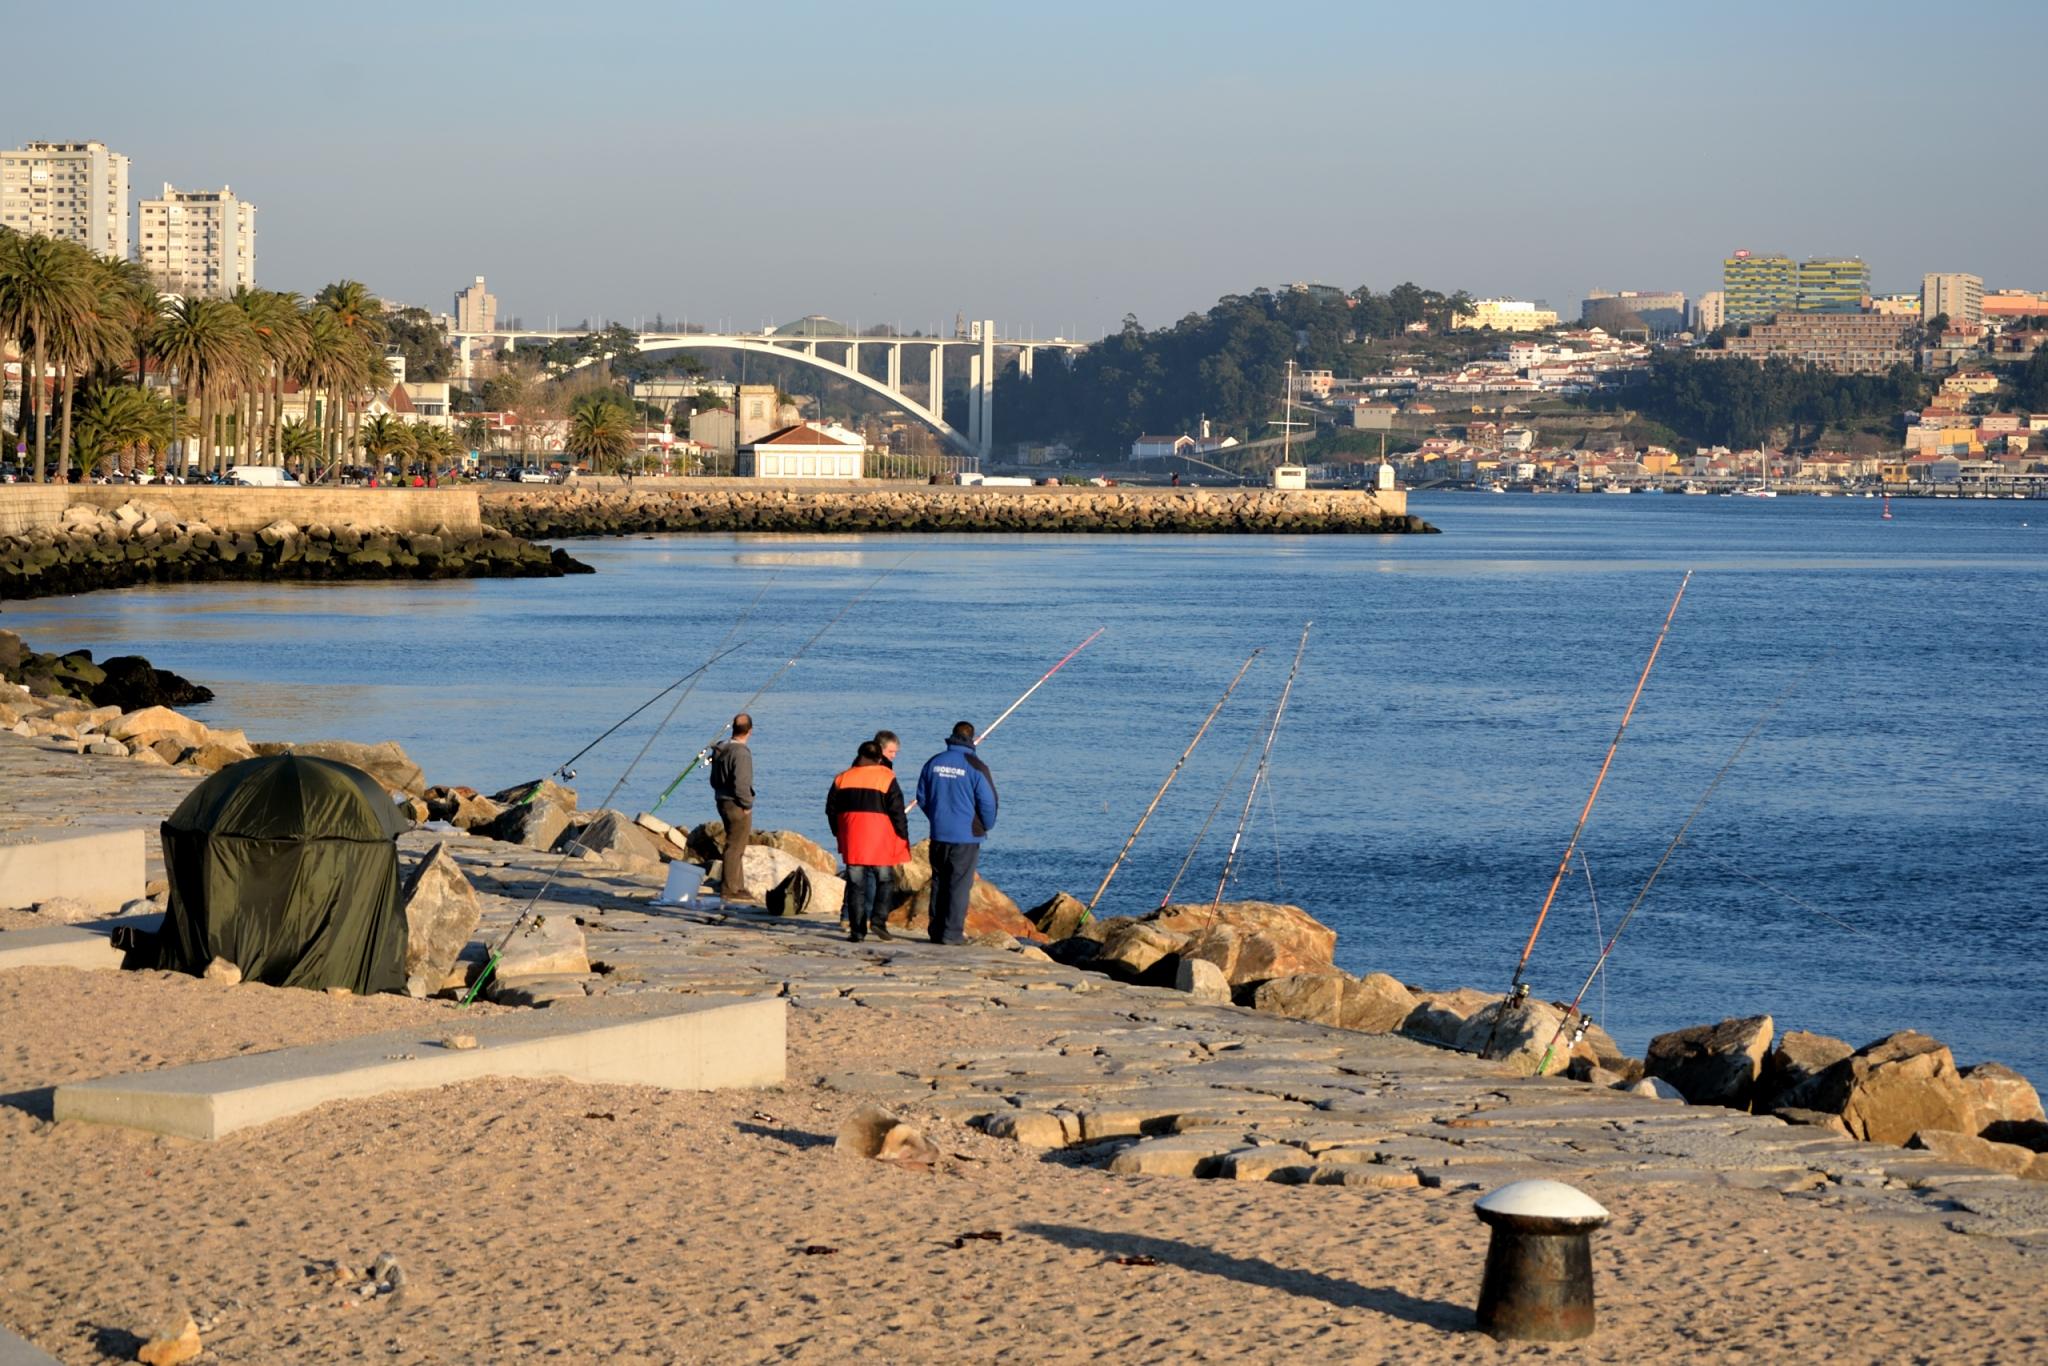 File:Foz do Douro, Porto, Portugal (7971357970).jpg - Wikimedia Commons